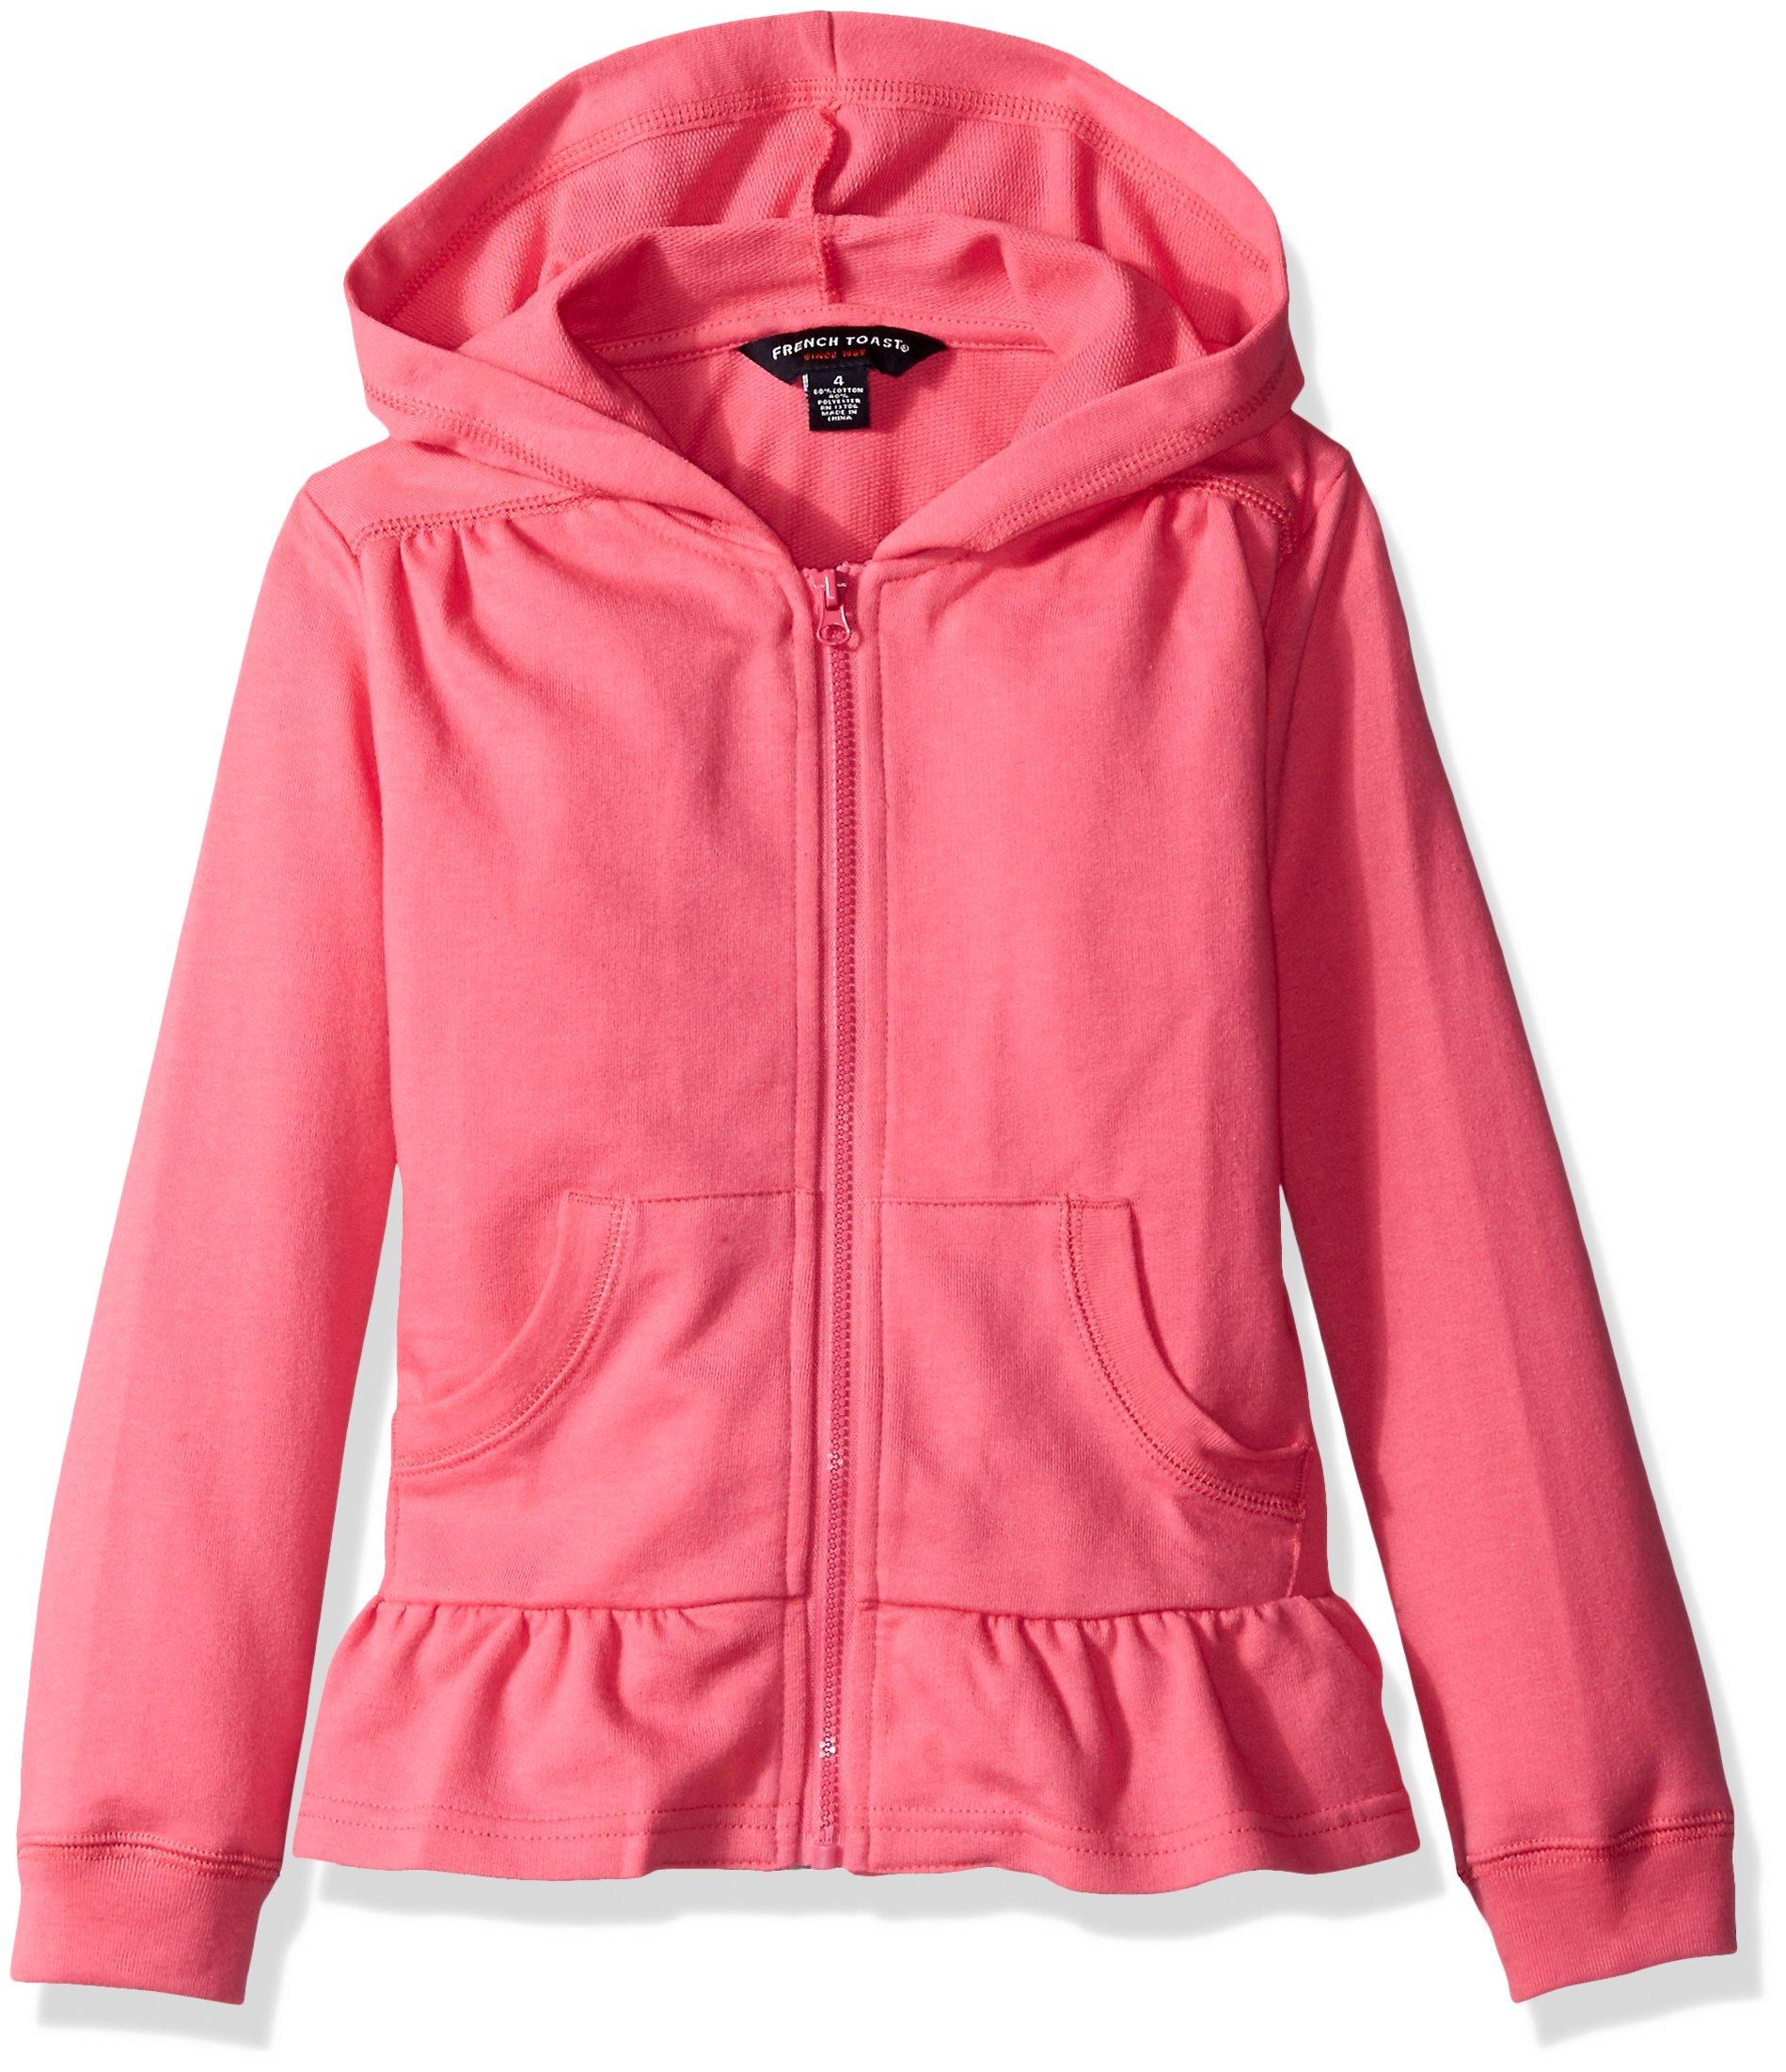 French Toast Girls' Big Ruffle Bottom Knit Jacket, Shocking Pink, XL (14/16)